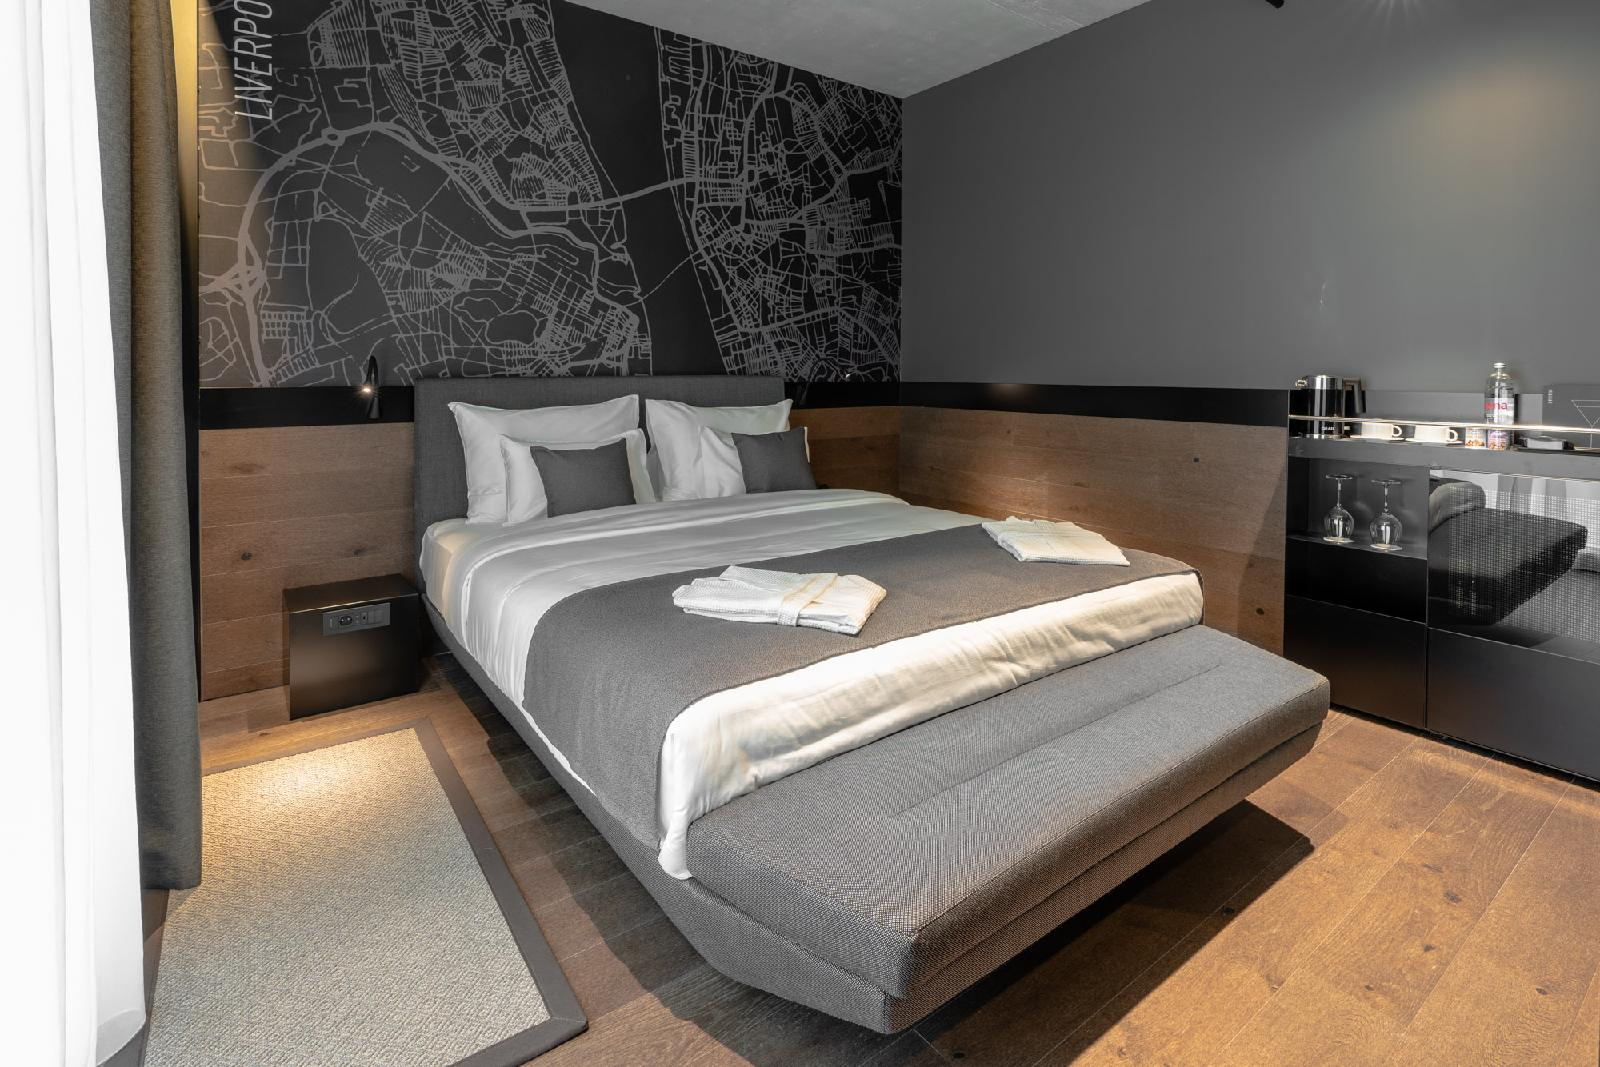 International Business Hotel Image 15